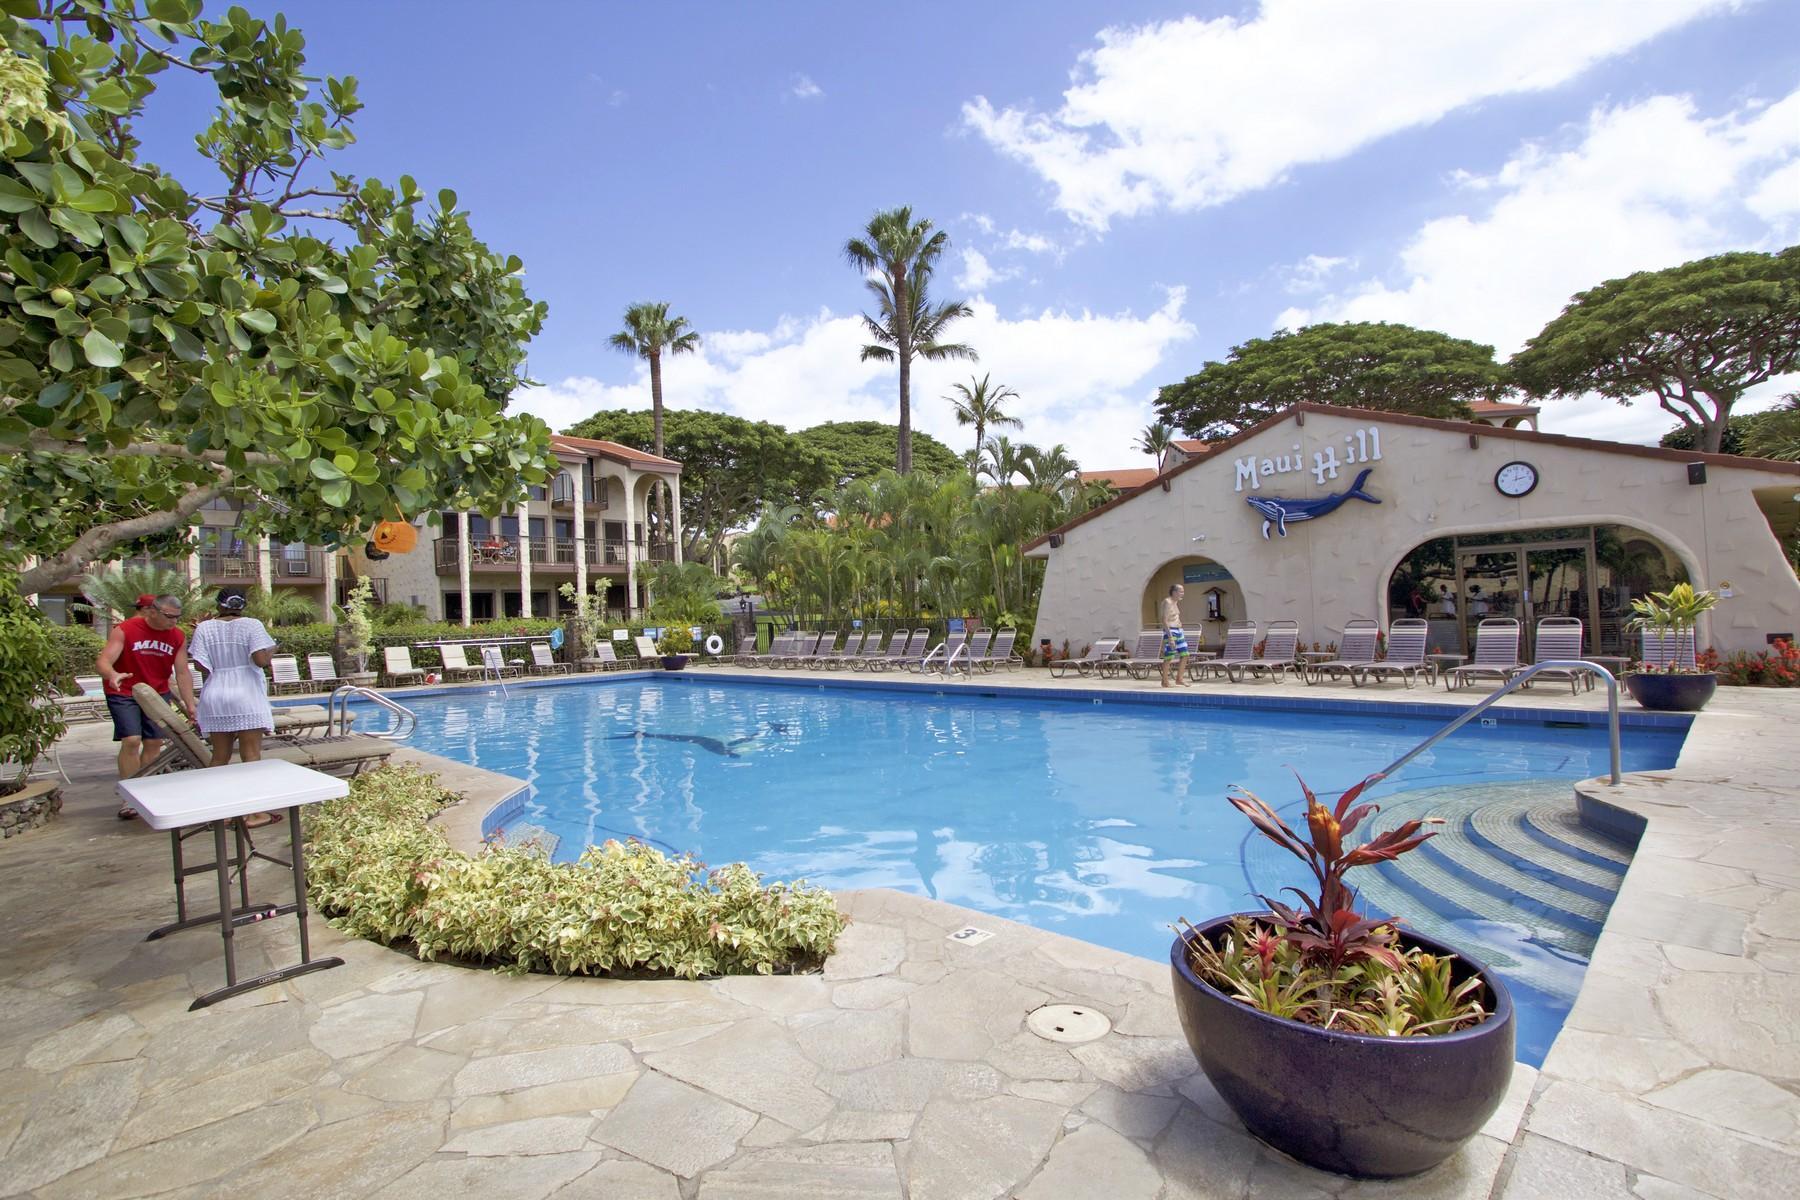 Condomínio para Venda às Where Your Family & Friends Can Come Together 2881 S Kihei Road, Maui Hill #70 Kihei, Havaí, 96753 Estados Unidos